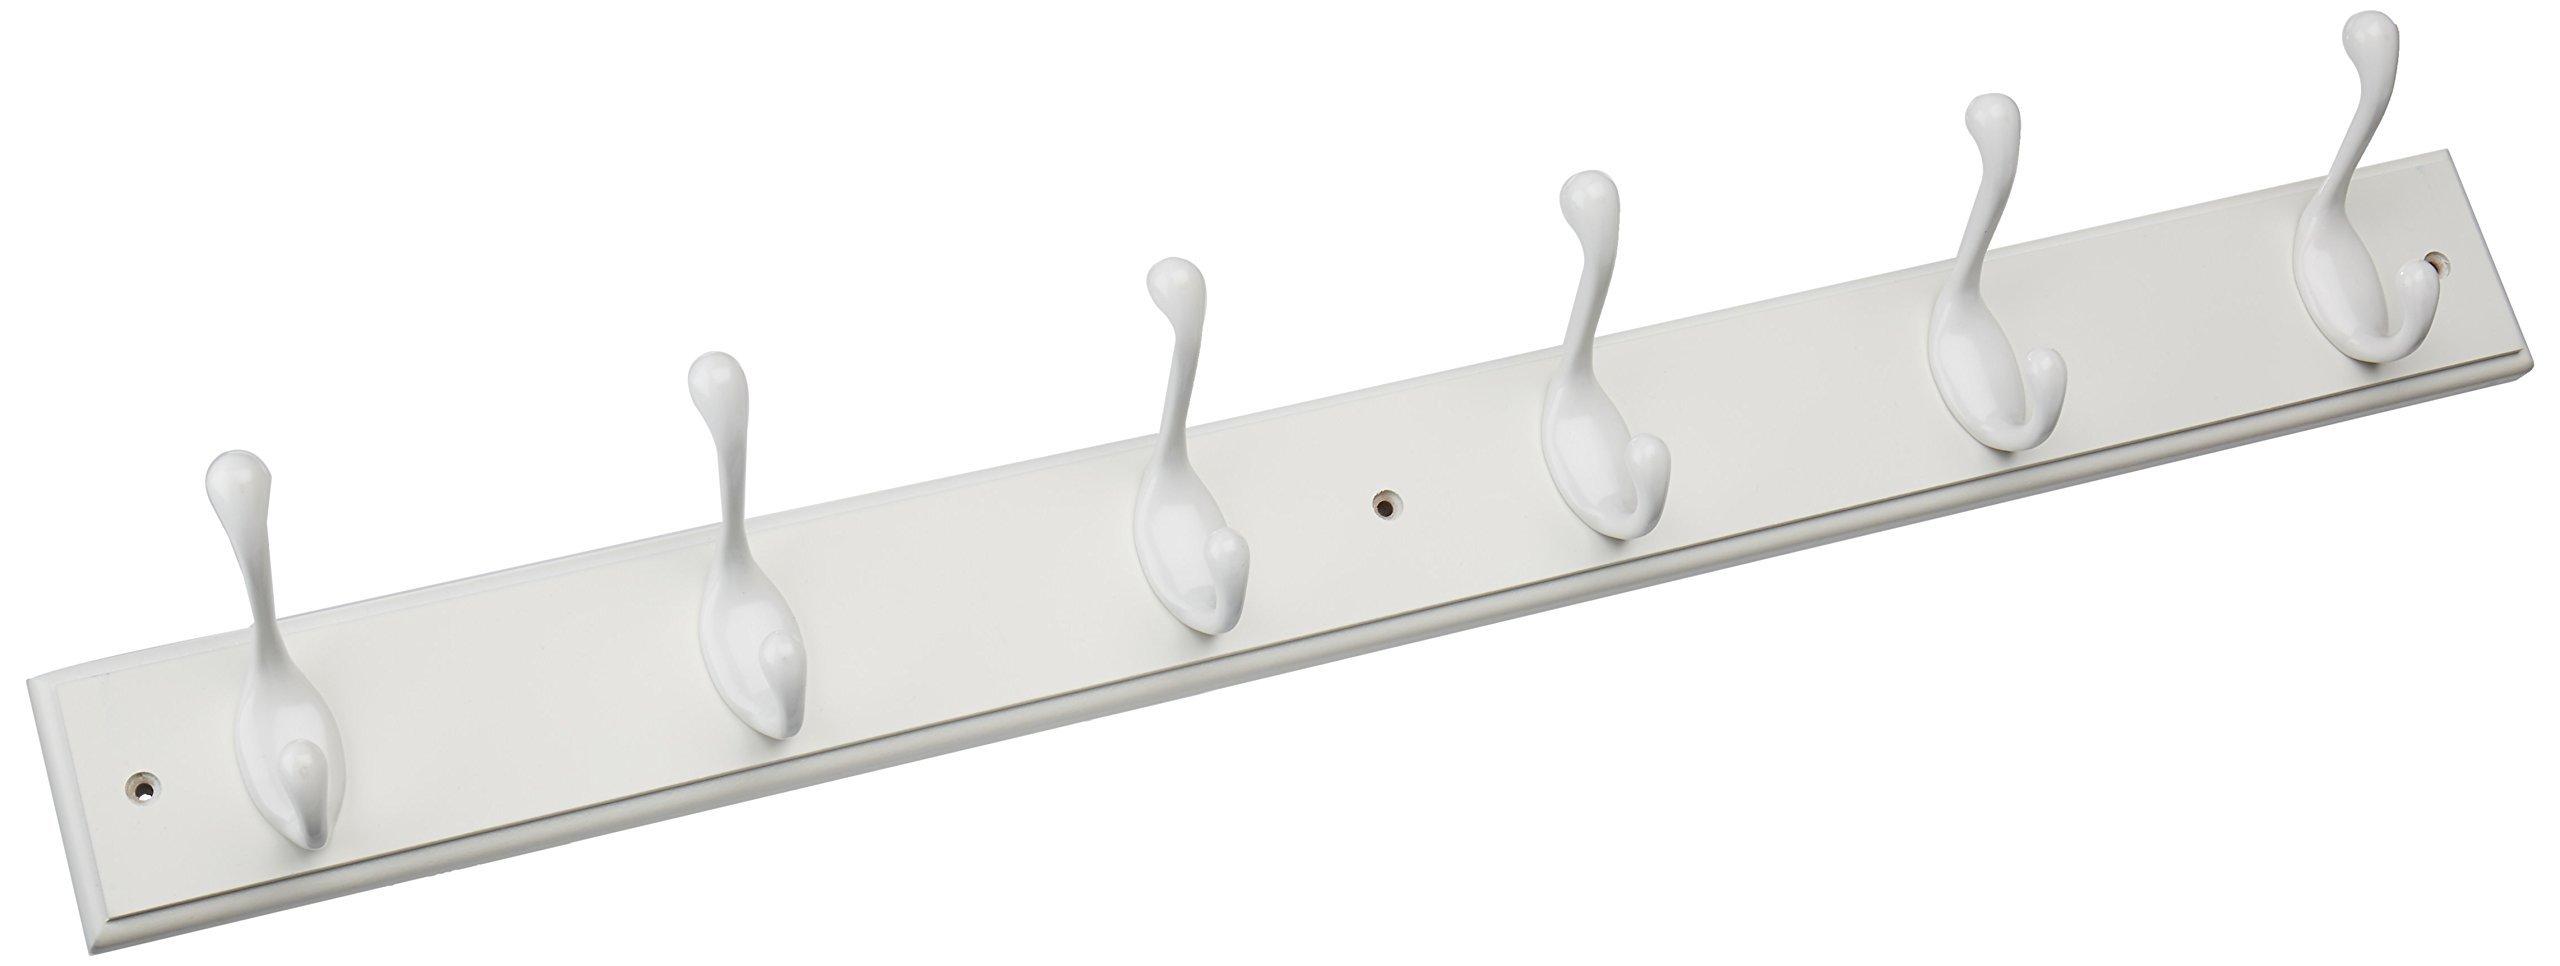 Brainerd RPLR6DJ-PWW-L1 27-Inch 6 Heavy Duty Coat and Hat Hook Rail/Rack, White and White